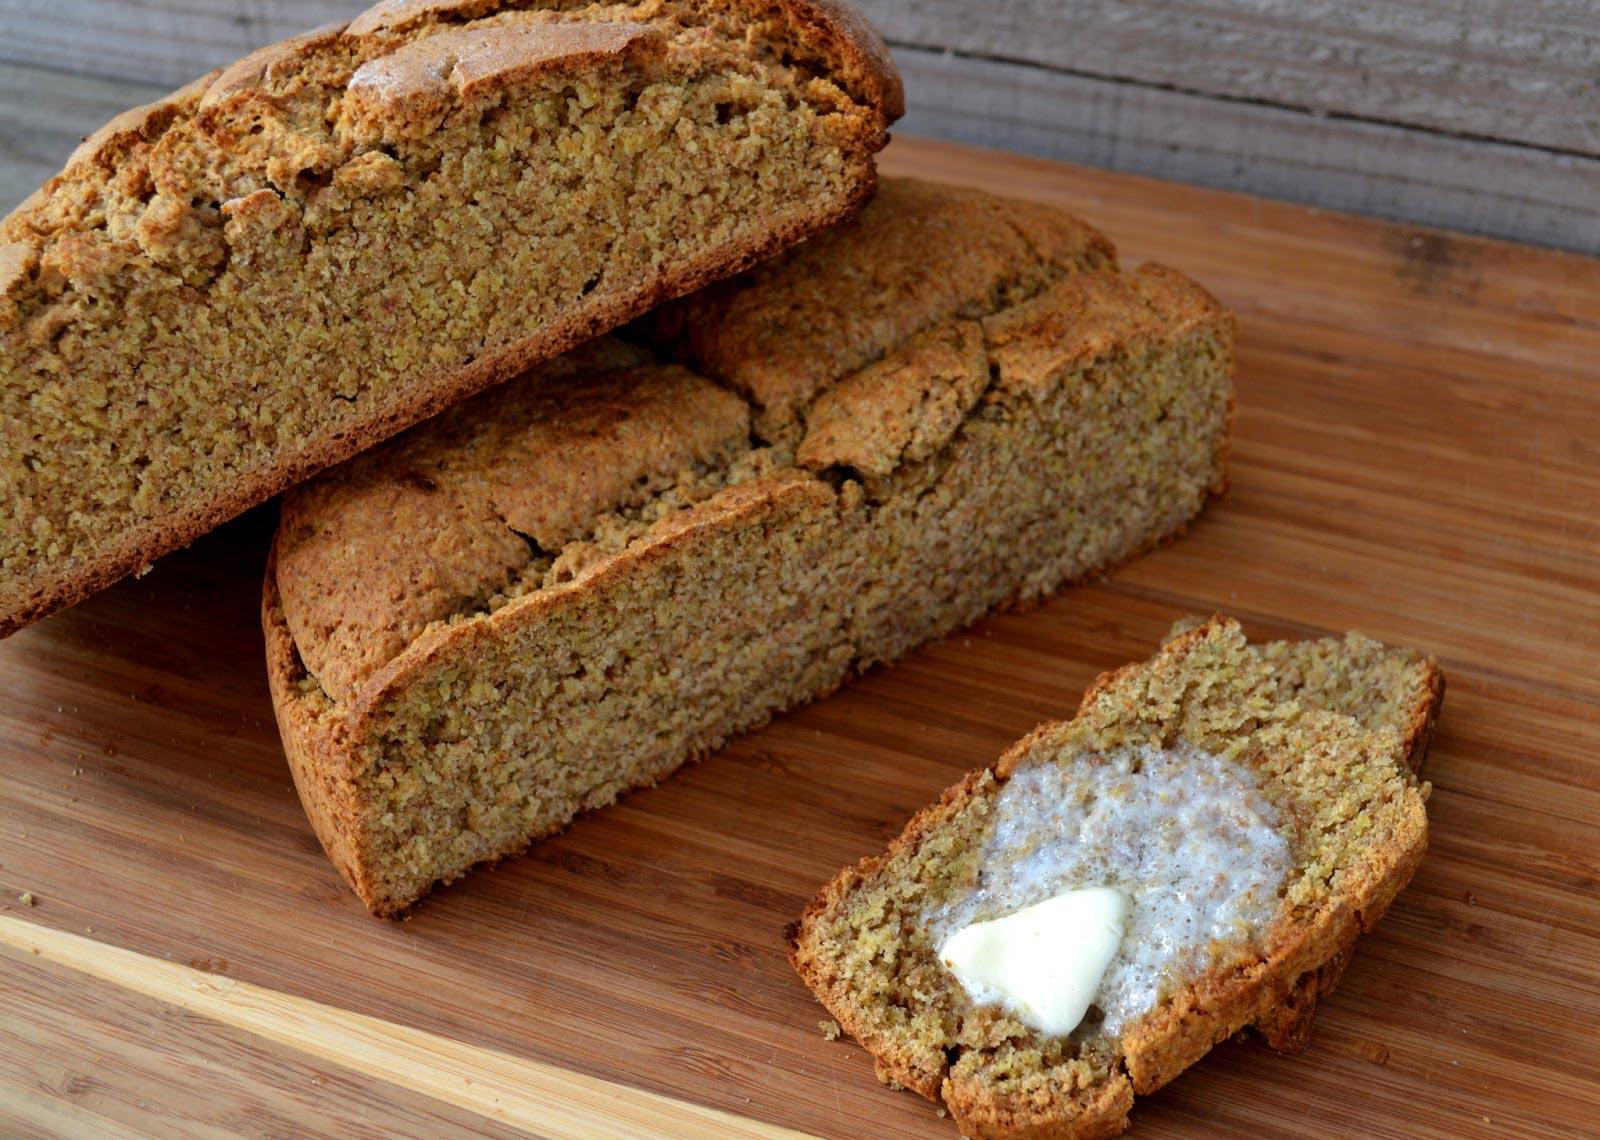 best-irish-soda-bread-recipe-st.-patrick's-day